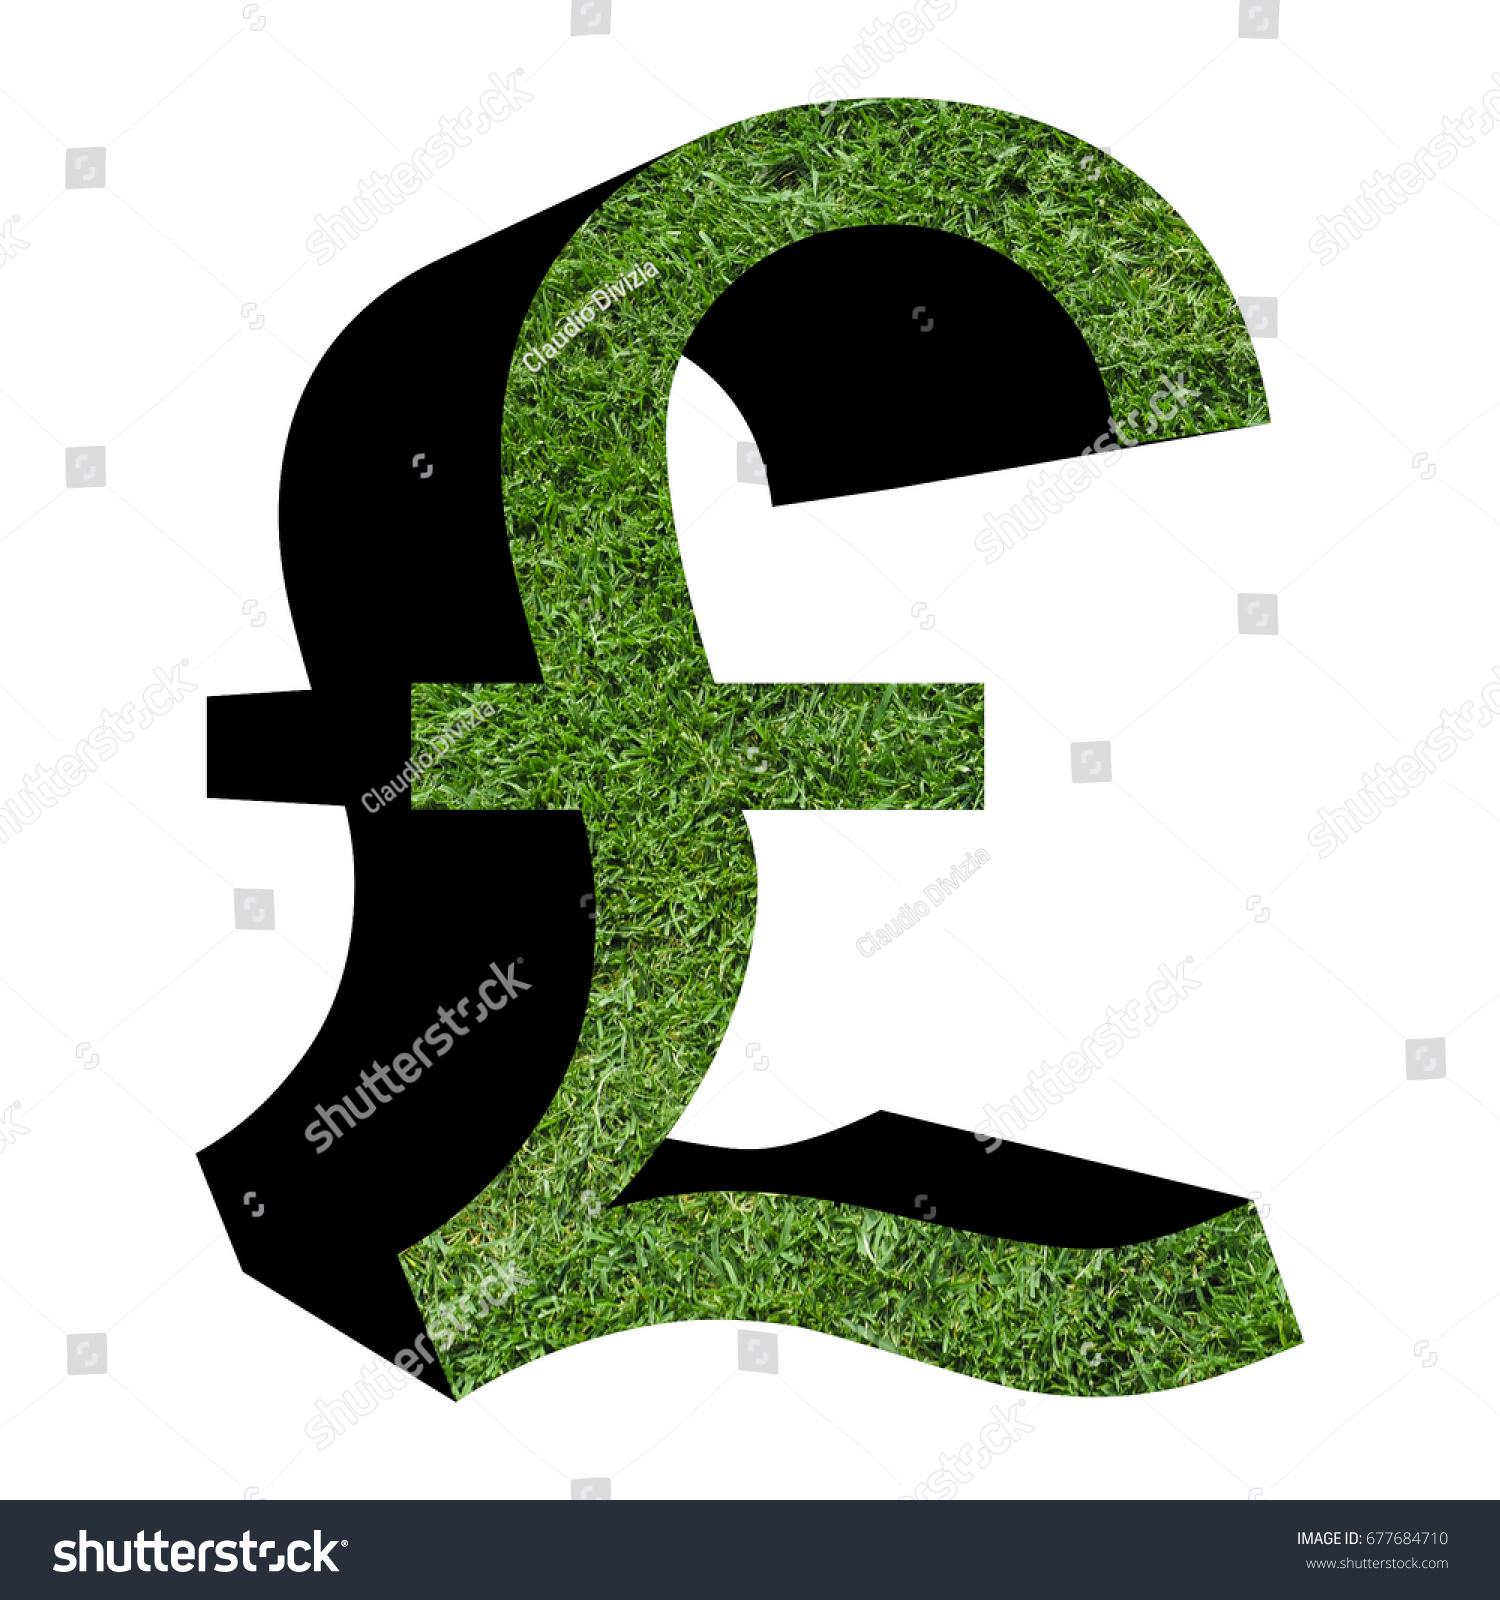 Symbol for uk pound choice image symbol and sign ideas gbp uk pound symbol grass texture stock illustration 677684710 gbp uk pound symbol with grass texture buycottarizona